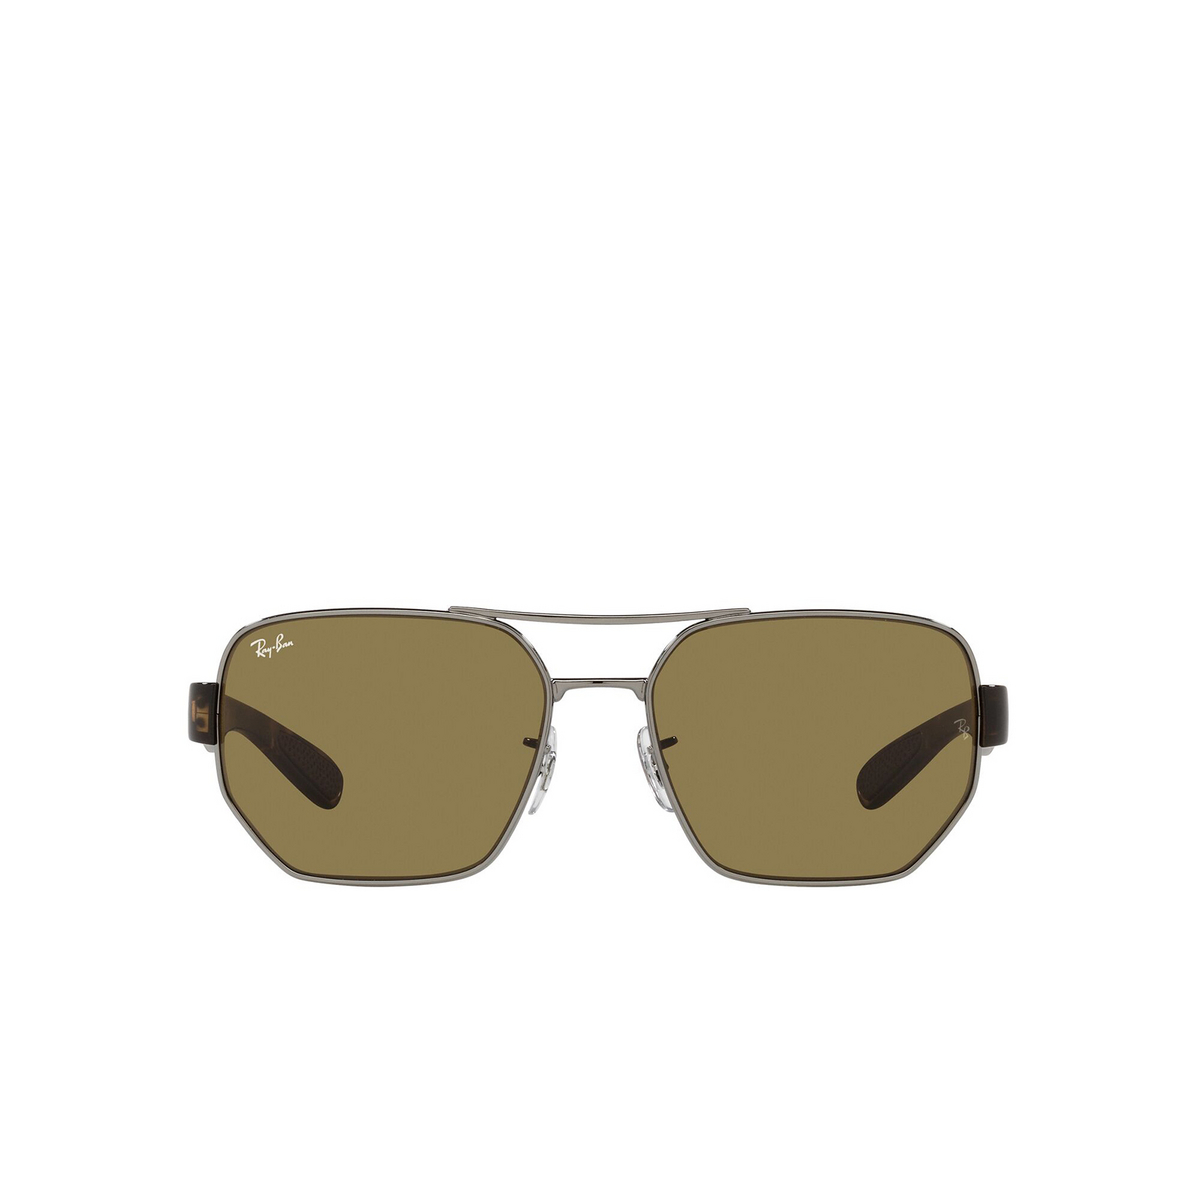 Ray-Ban® Irregular Sunglasses: RB3672 color Gunmetal 004/73 - front view.